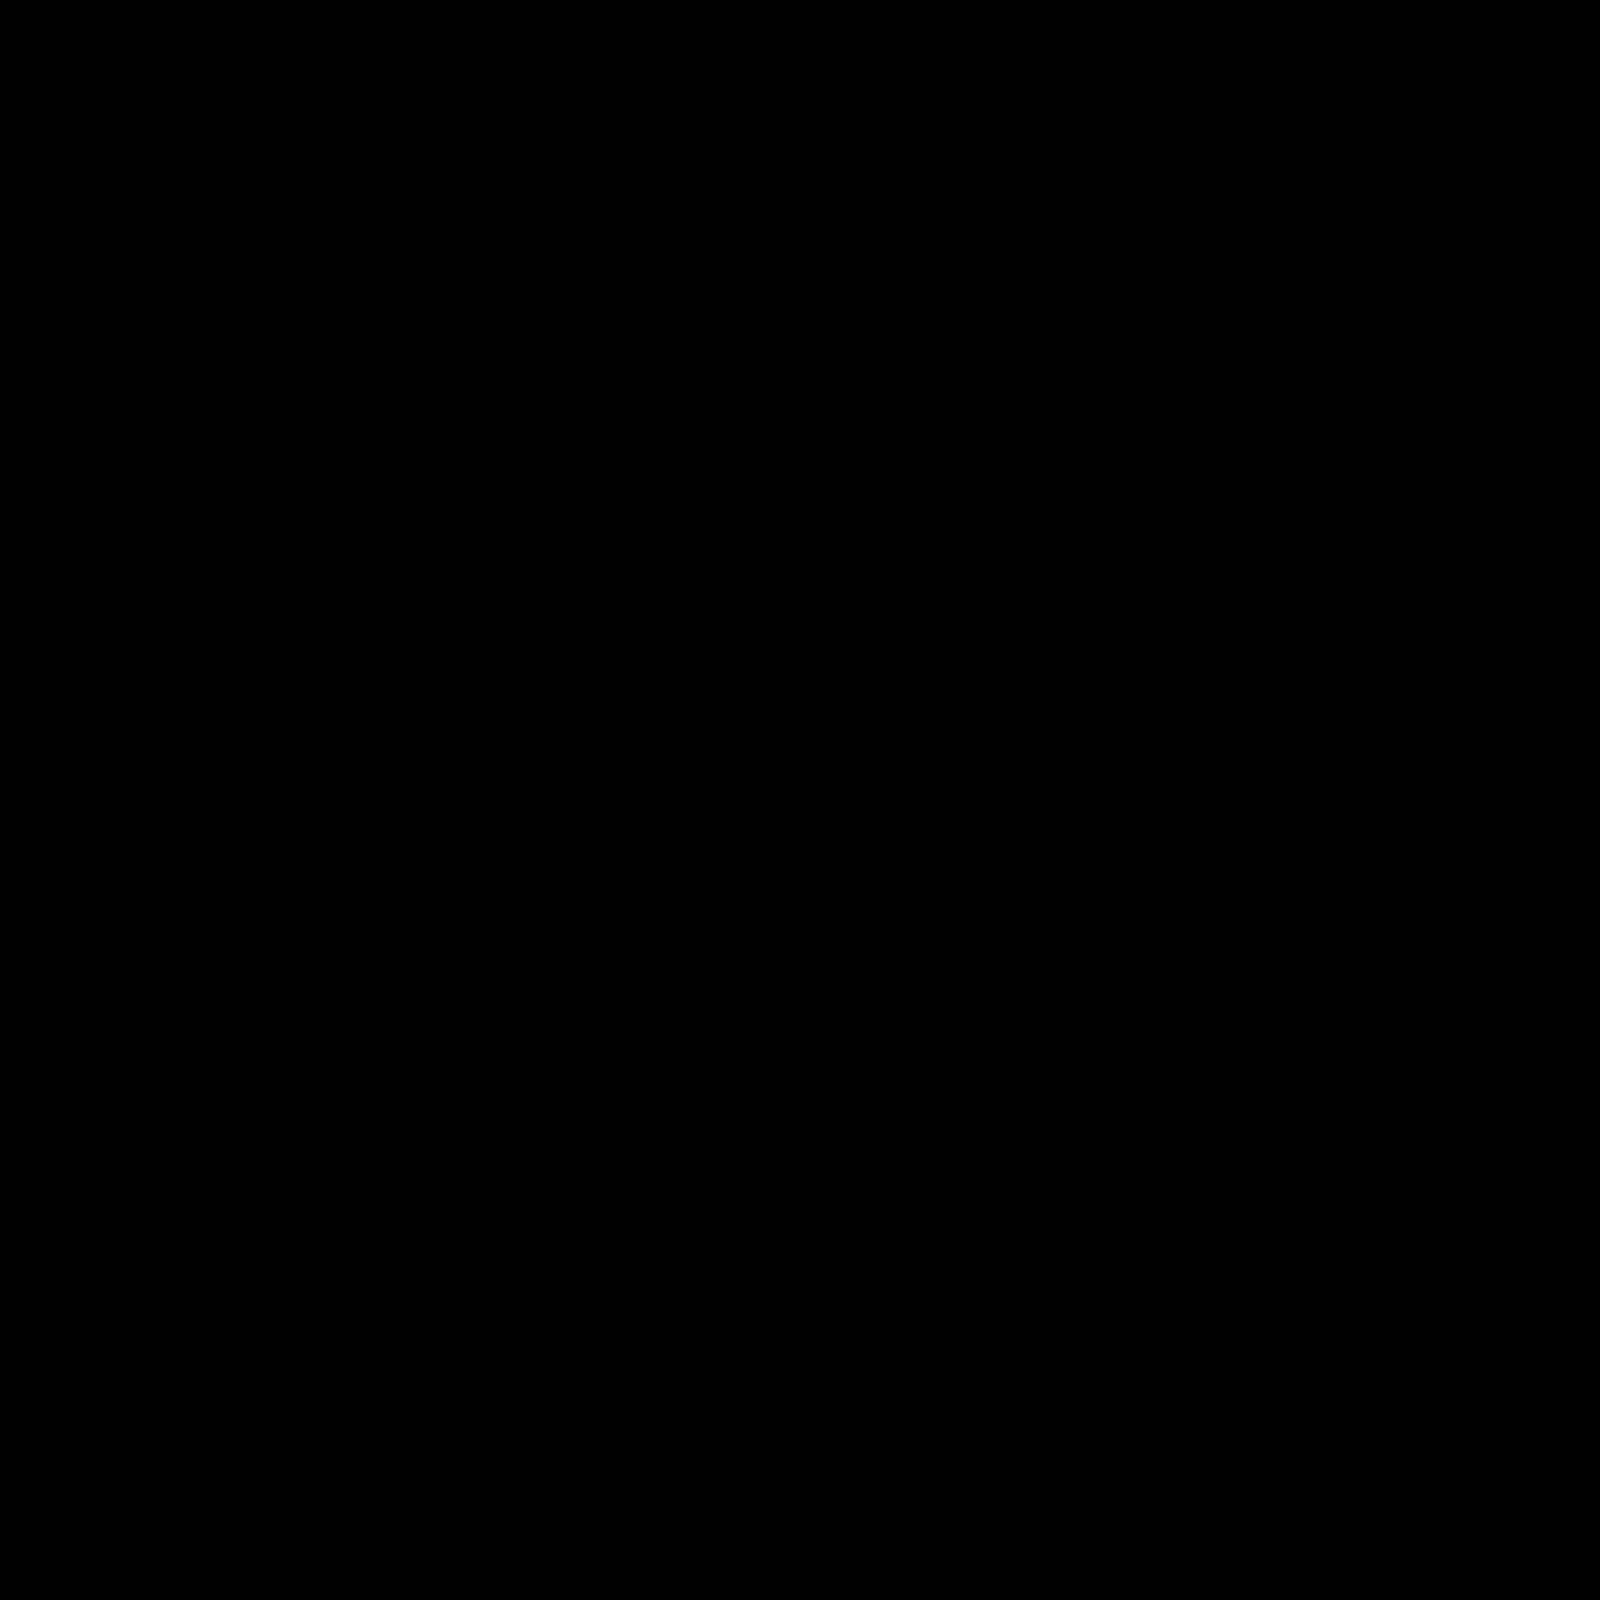 Peeling Filled icon